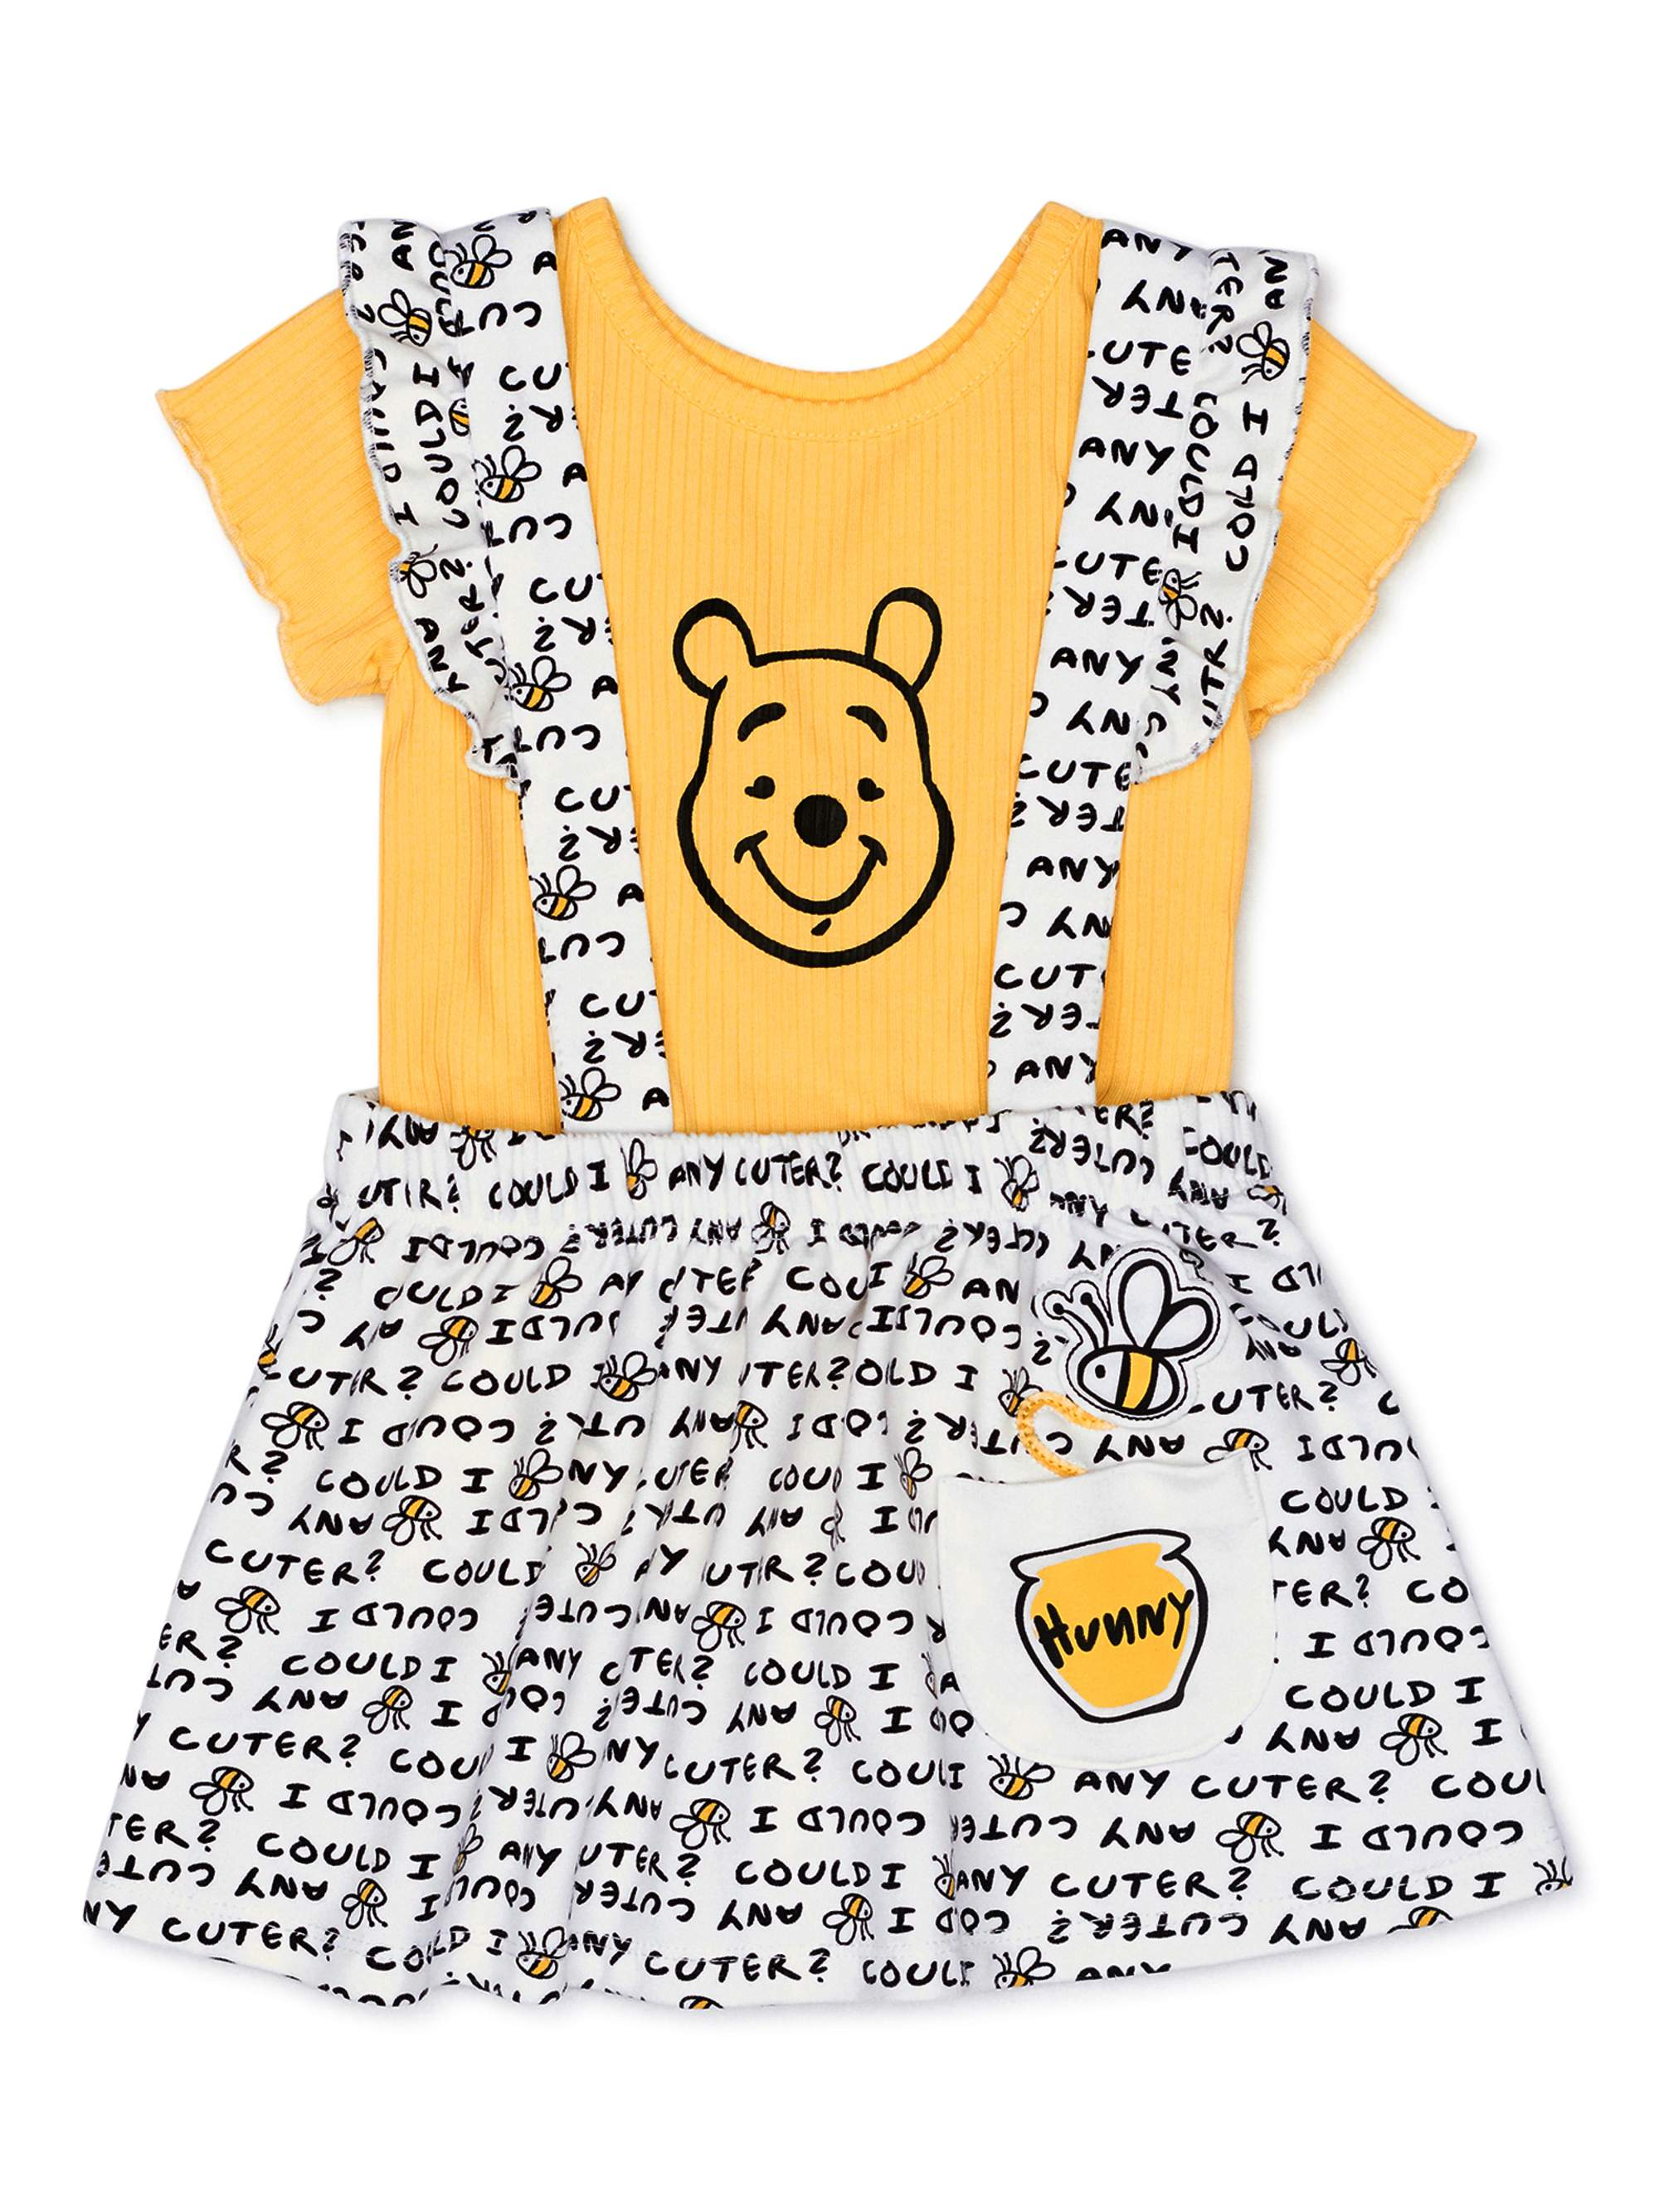 Winnie The Pooh Baby Shower Decorations Walmart : winnie, shower, decorations, walmart, Winnie, Disney, Pinafore, Walmart.com